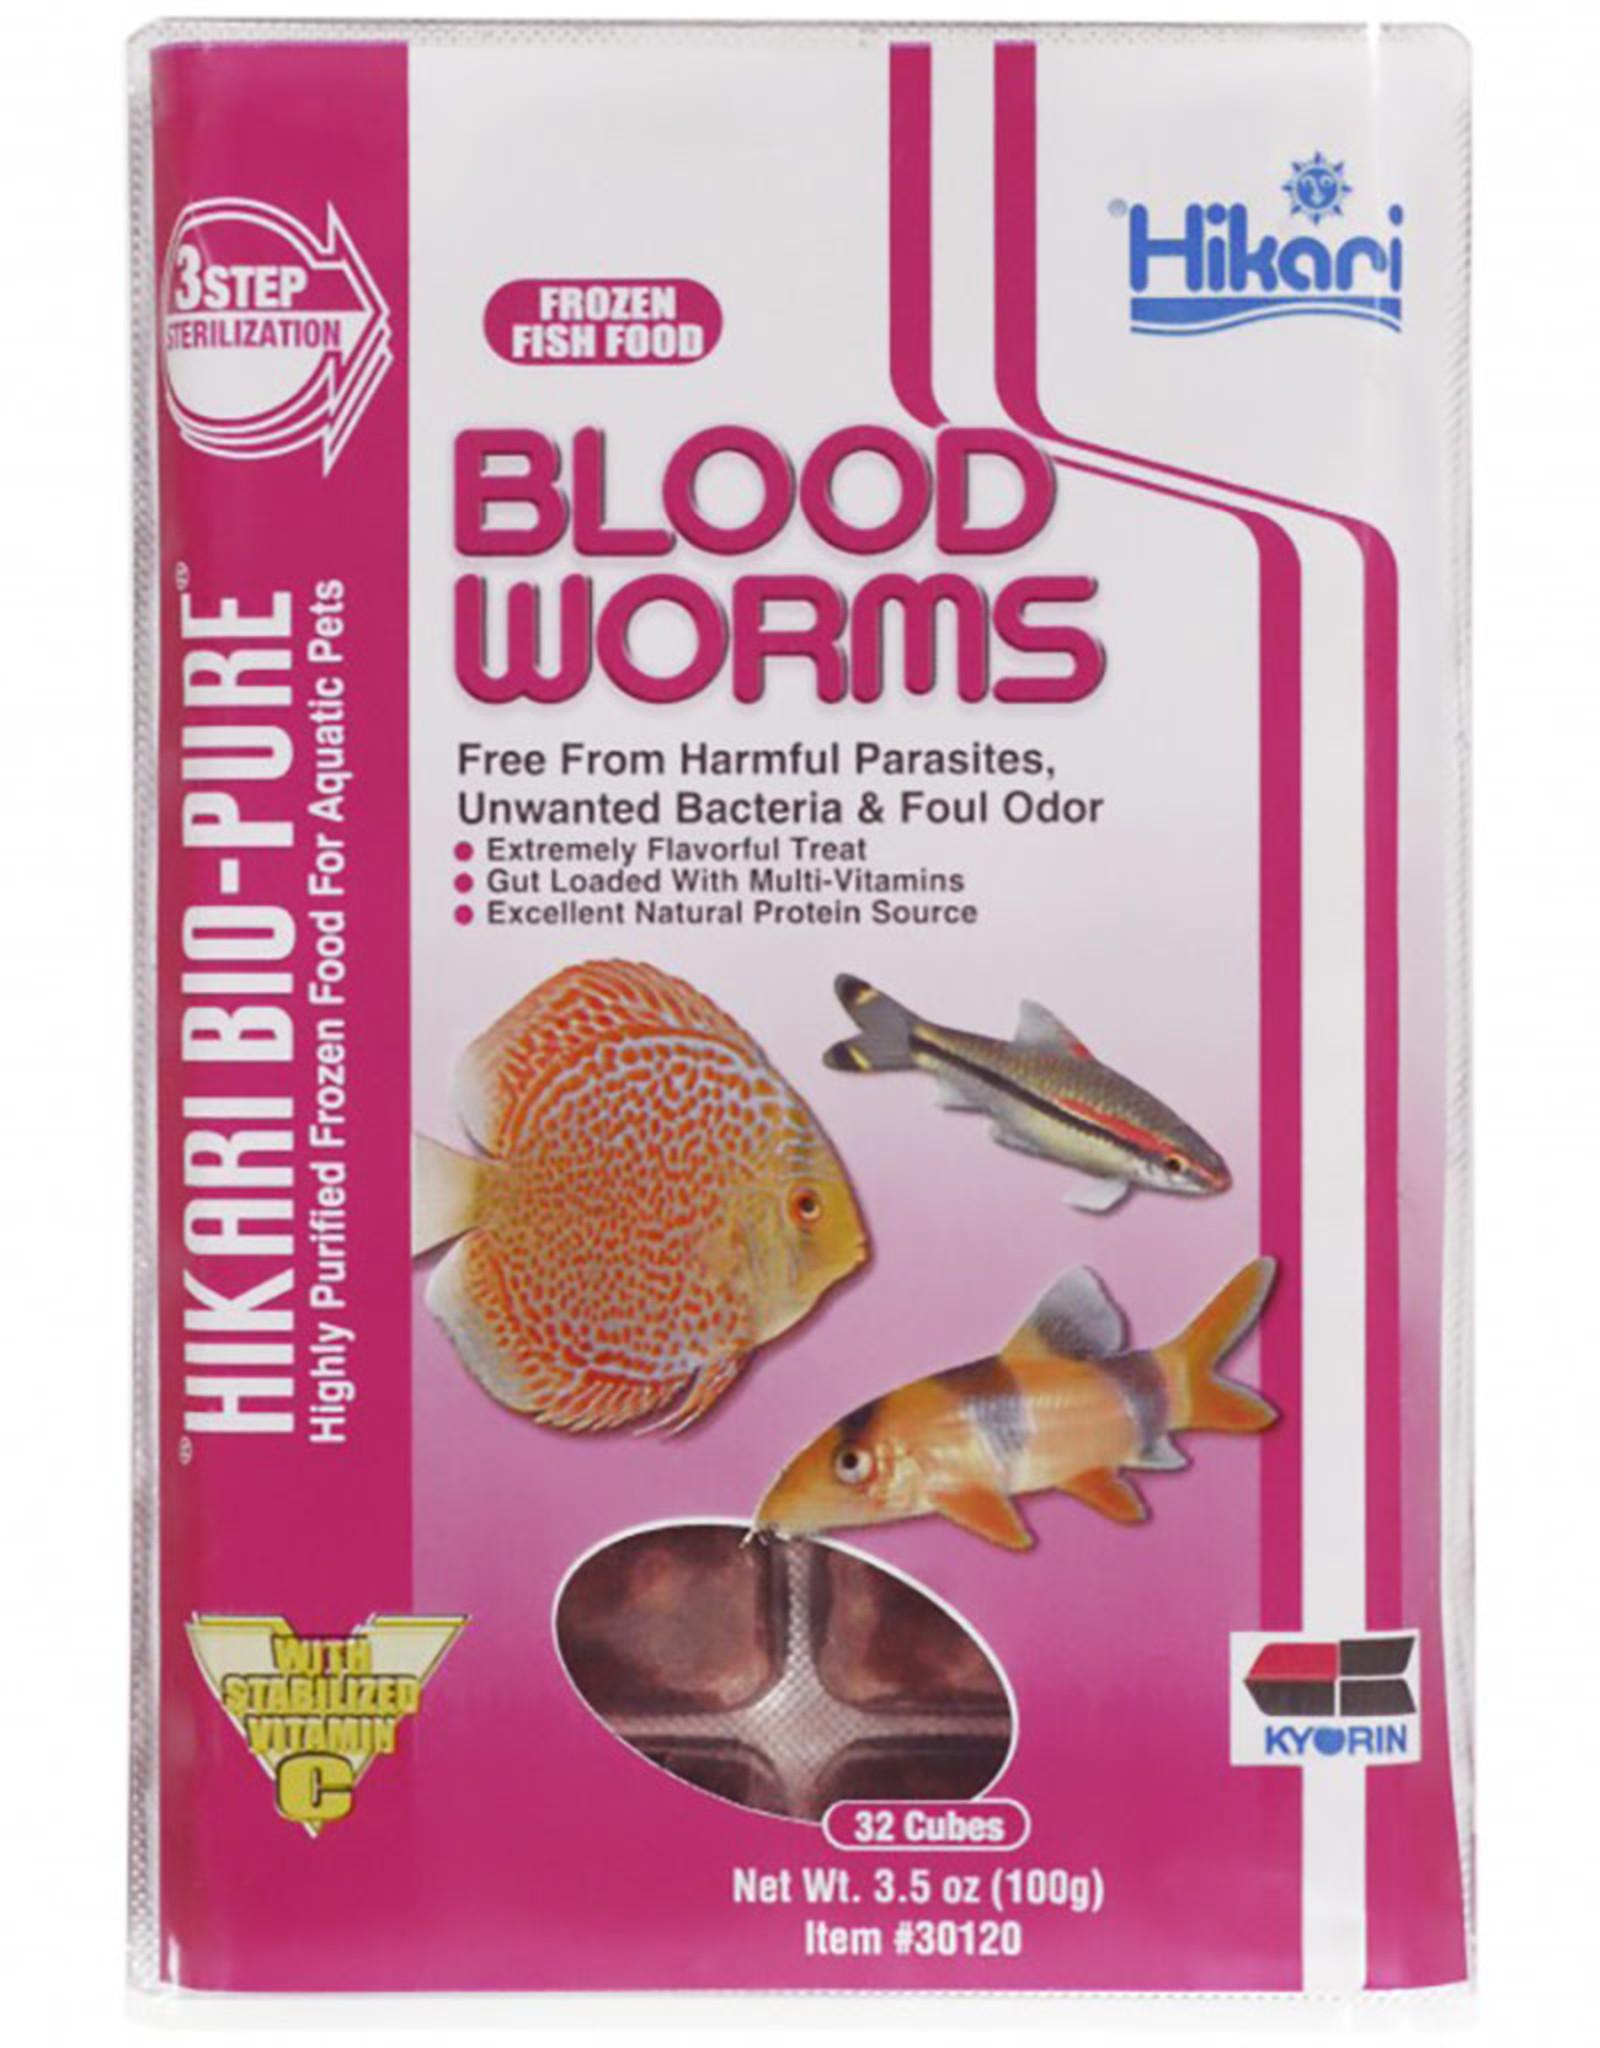 HIKARI USA INC. Frz Blood Worms 3.5oz cube